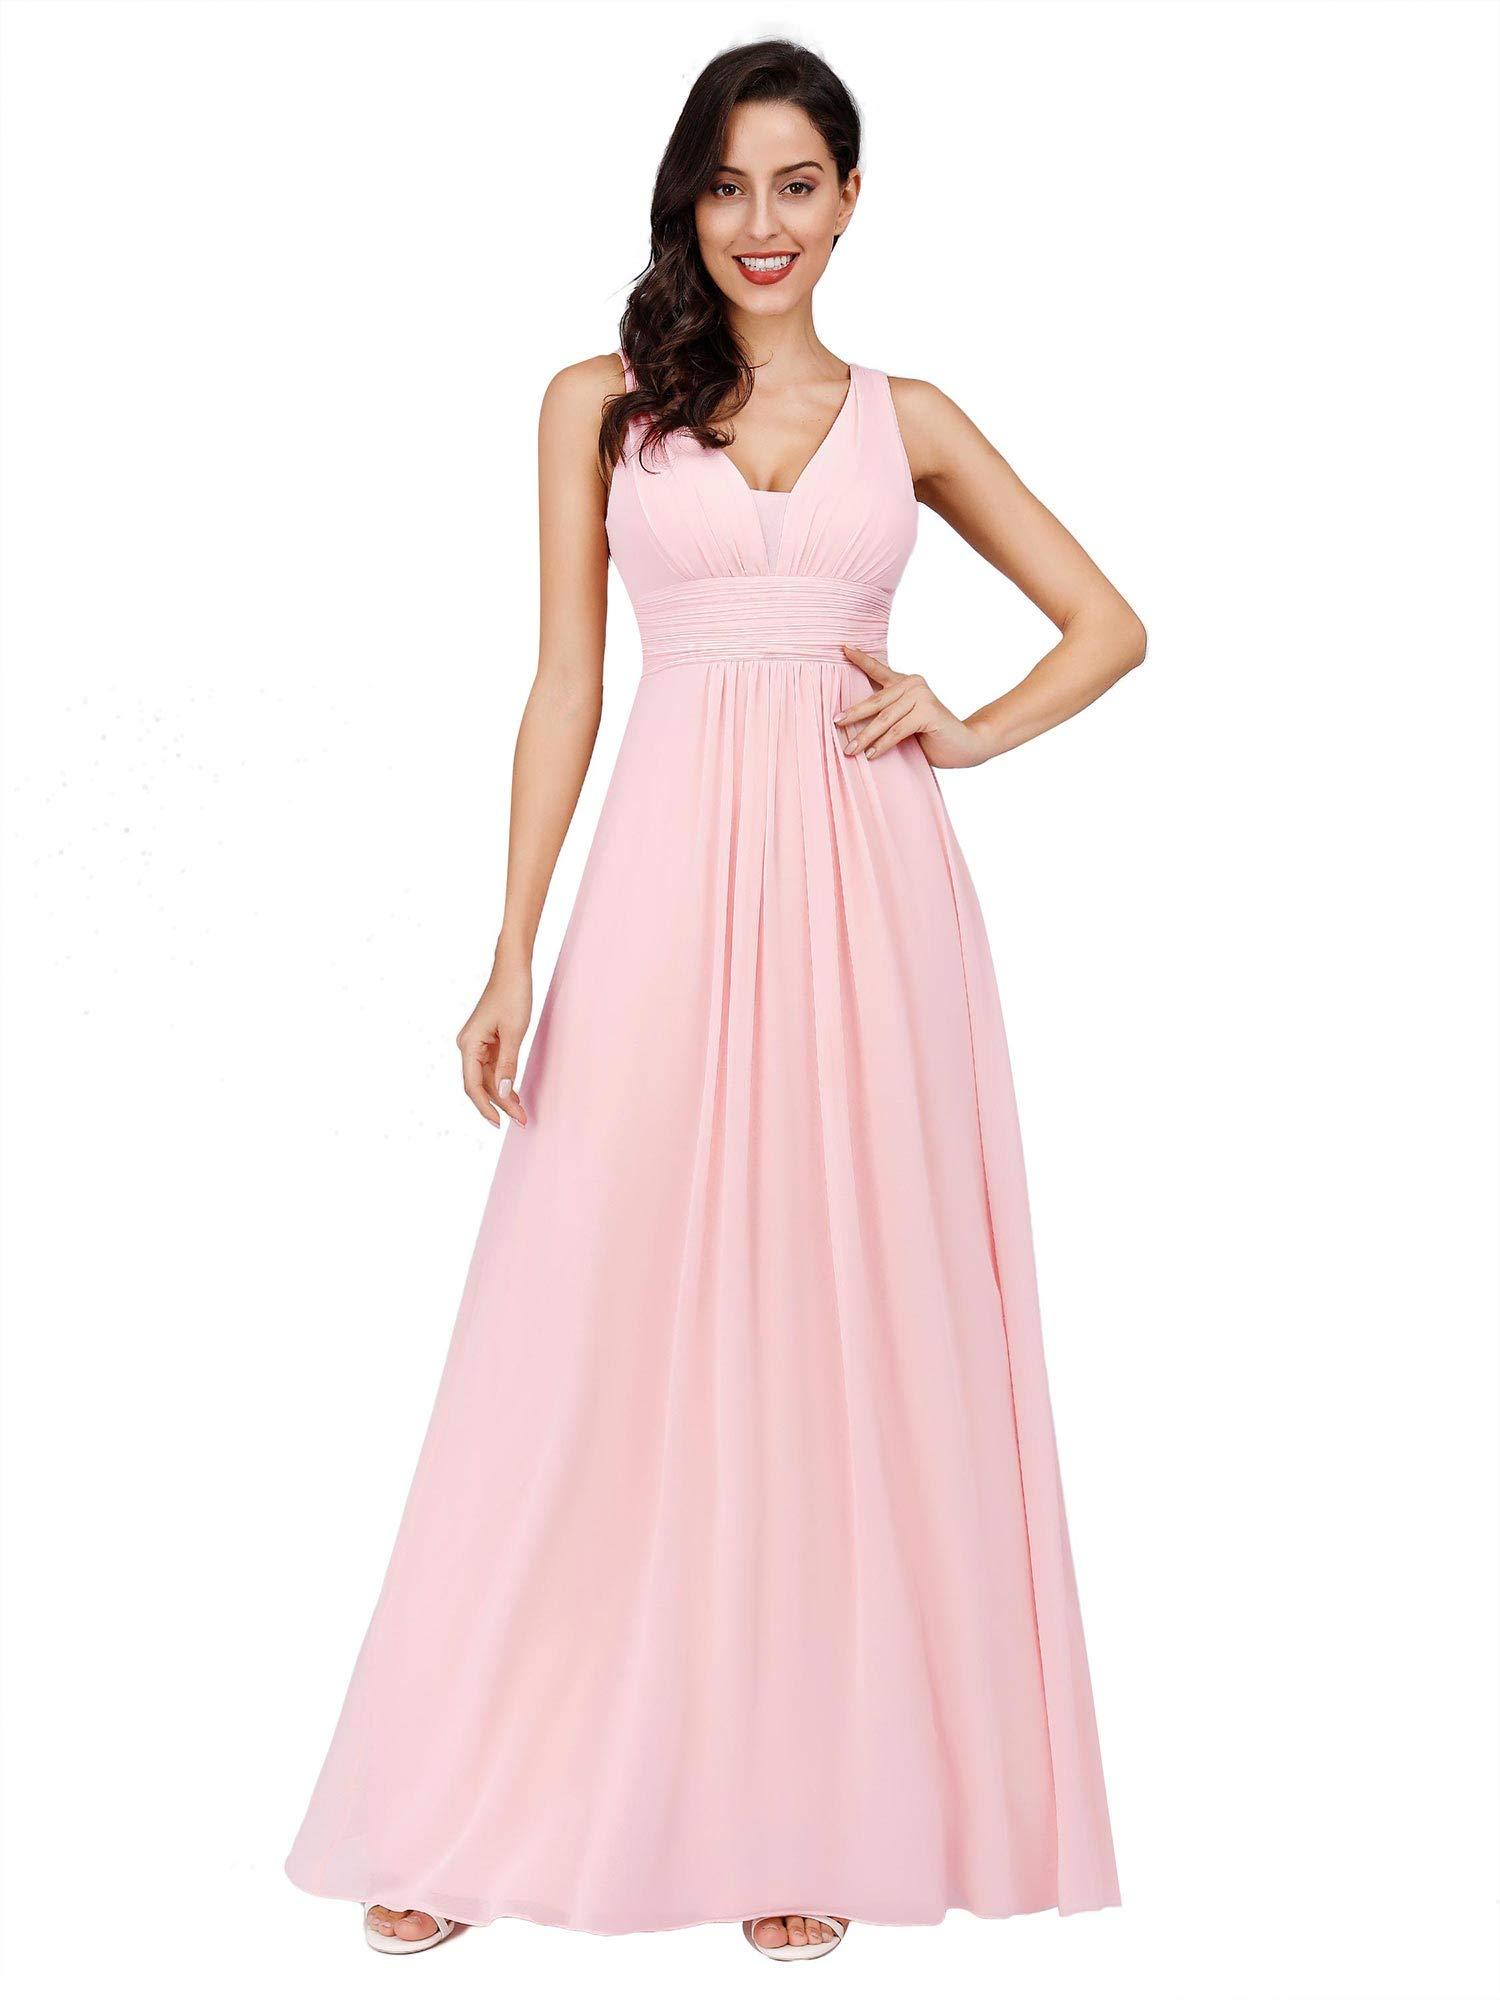 Ever-Pretty Escote en V Vestido de Fiesta Noche Largo para Mujer Corte Imperio 08110 product image